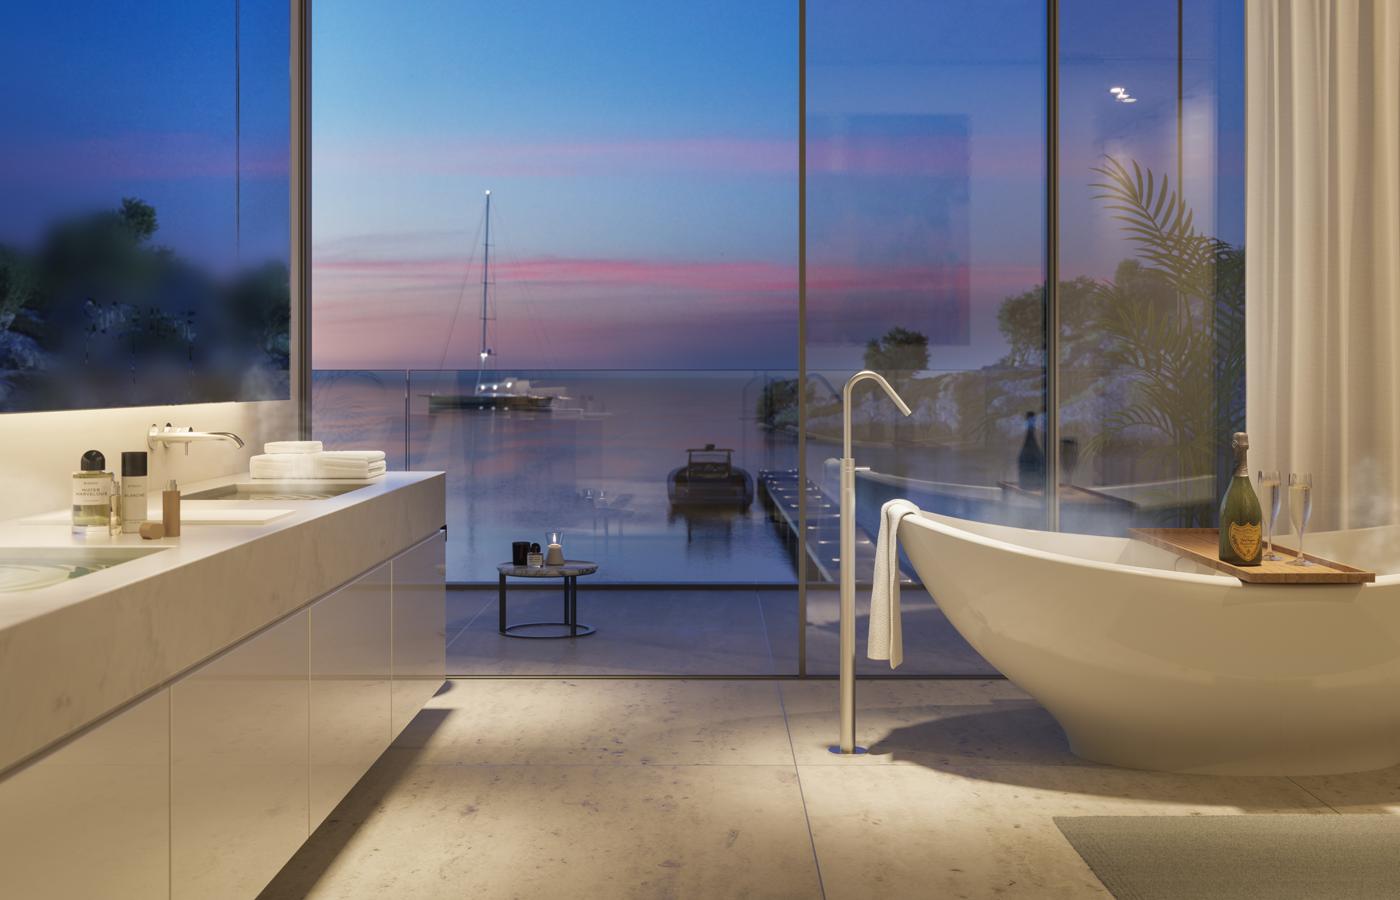 Luksus pÃ¥ en øde ø – luxury aficionados